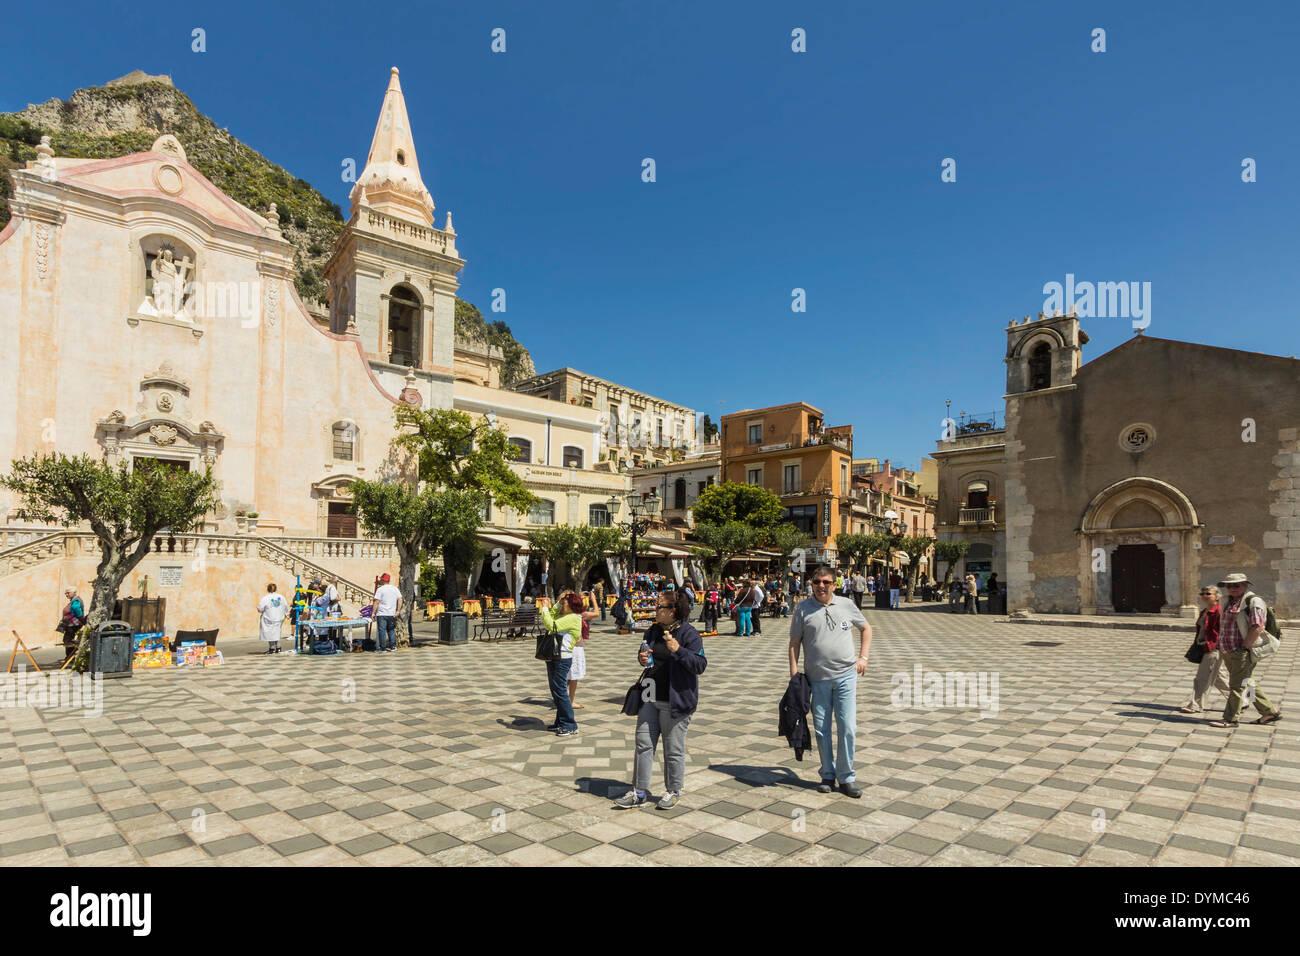 San Giuseppe Church & Piazza 9 April on Corso Umberto in this popular NE tourist town; Taormina, Catania Province, Sicily, Italy - Stock Image